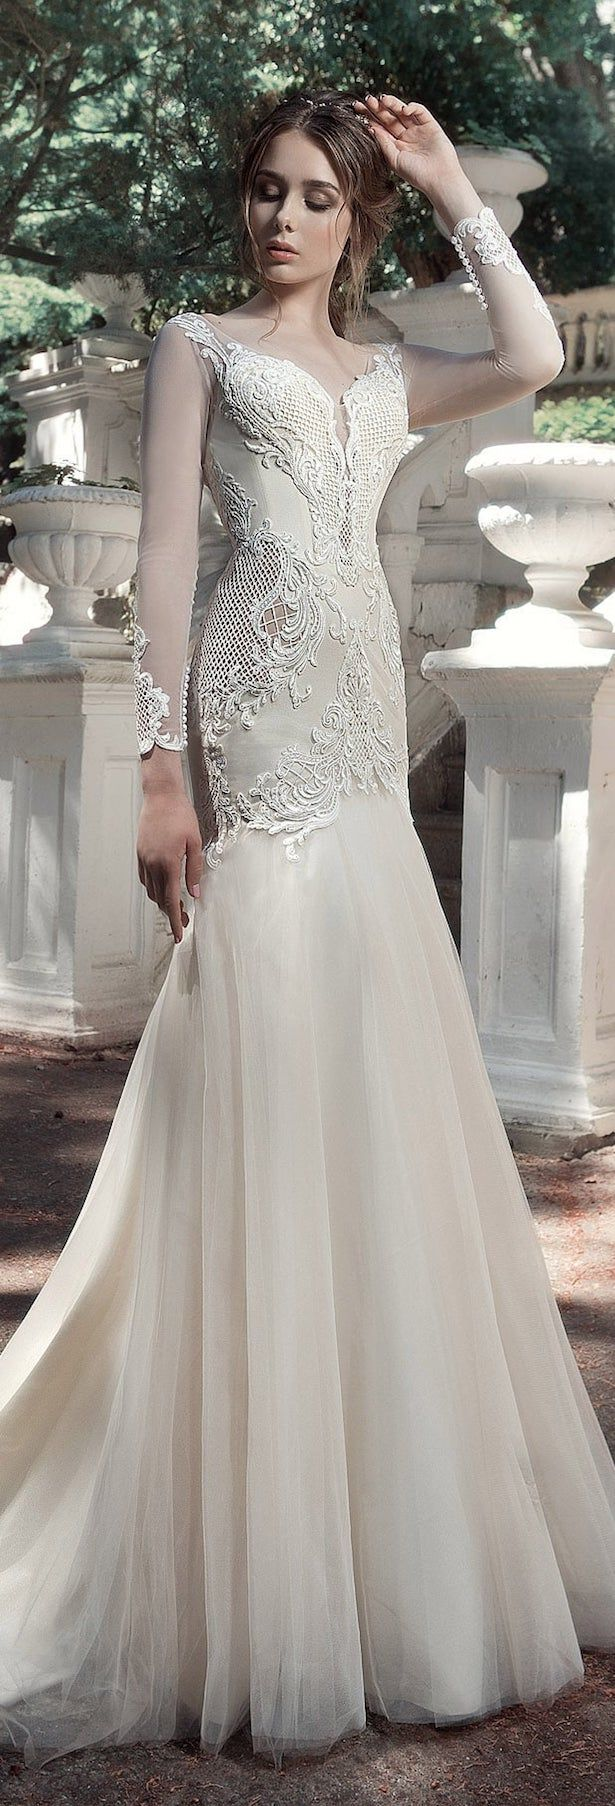 Milva 2017 Wedding Dresses – Sunrise Collection | Mädchentraum ...